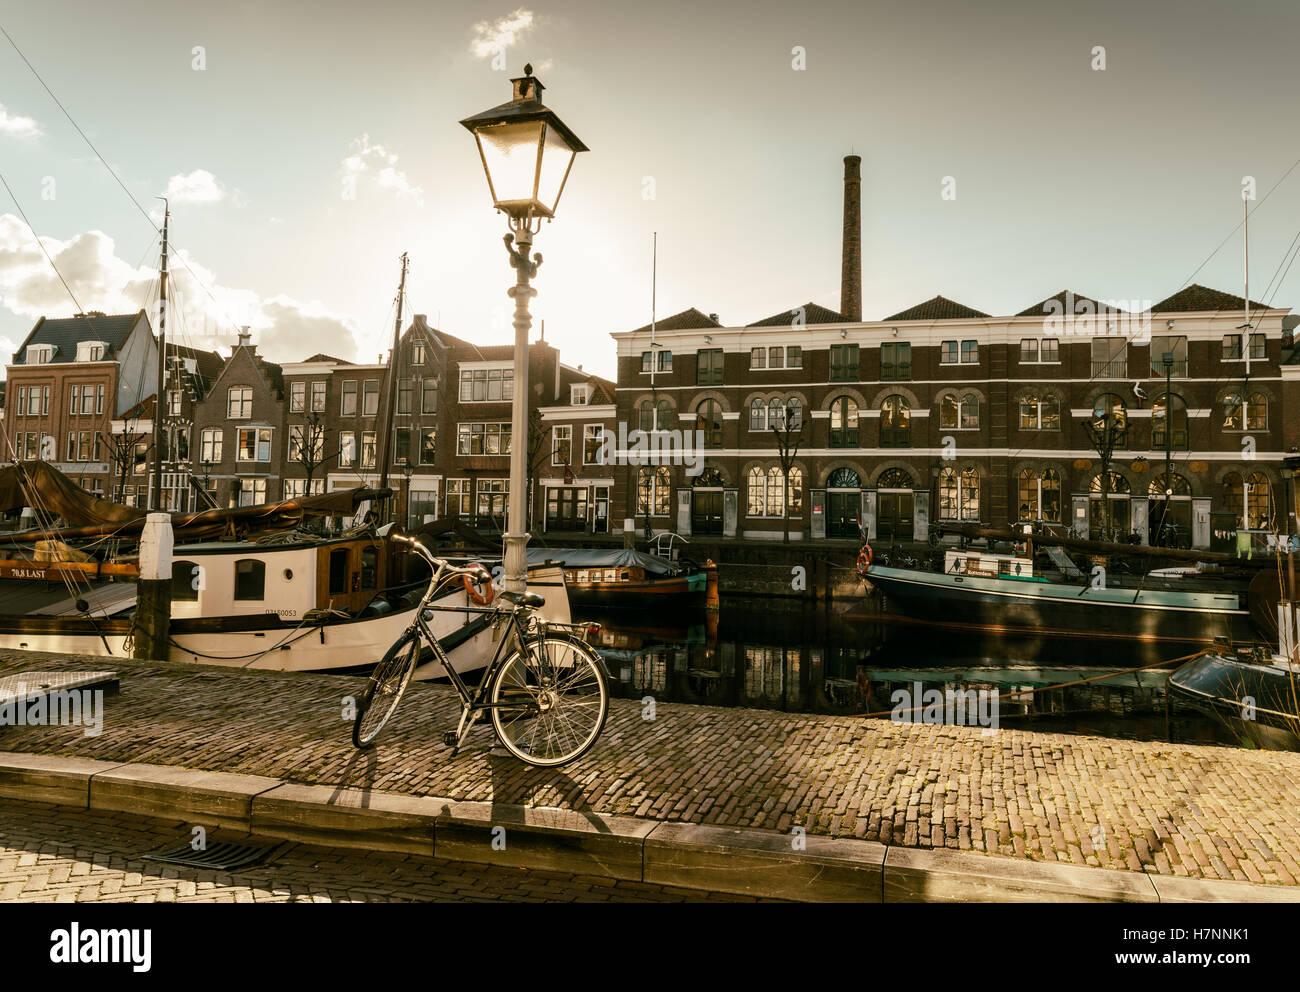 Delfshaven, Rotterdam, Netherlands - vintage style Stock Photo